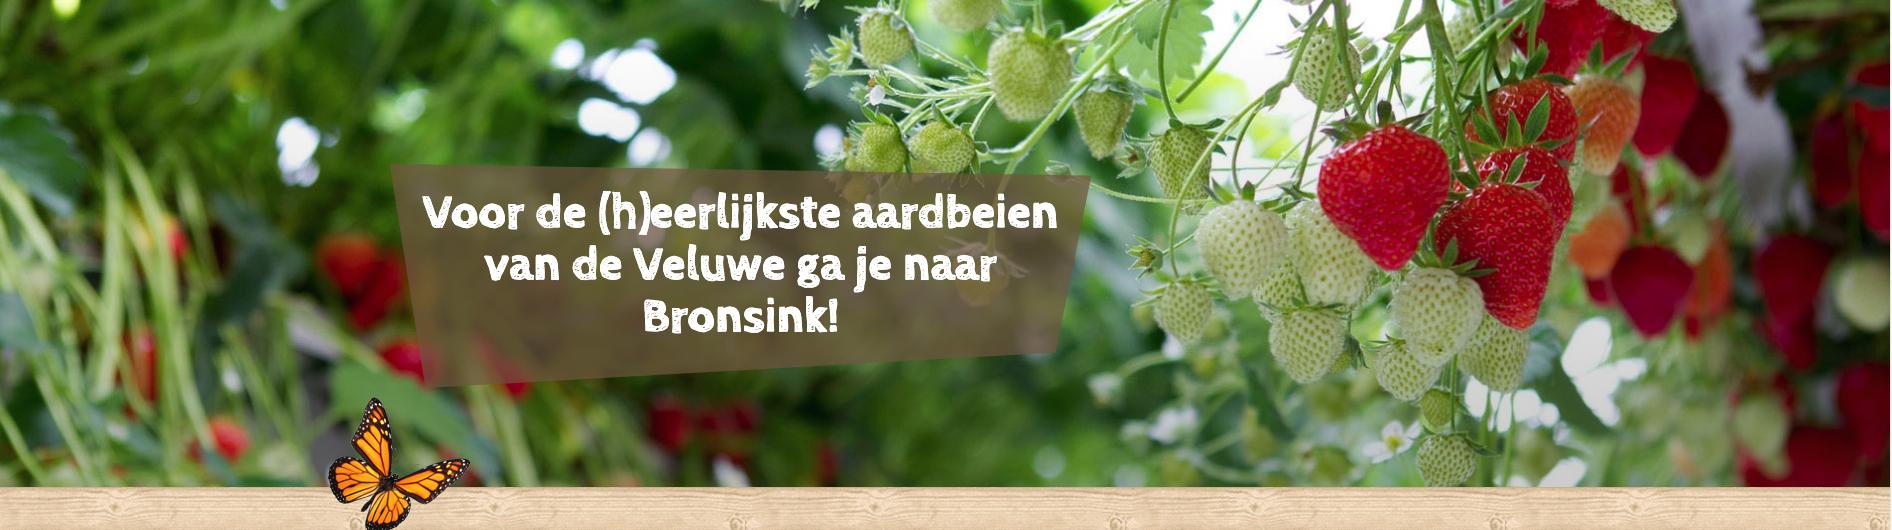 Streekproduct: aardbeien van de familie Bronsink